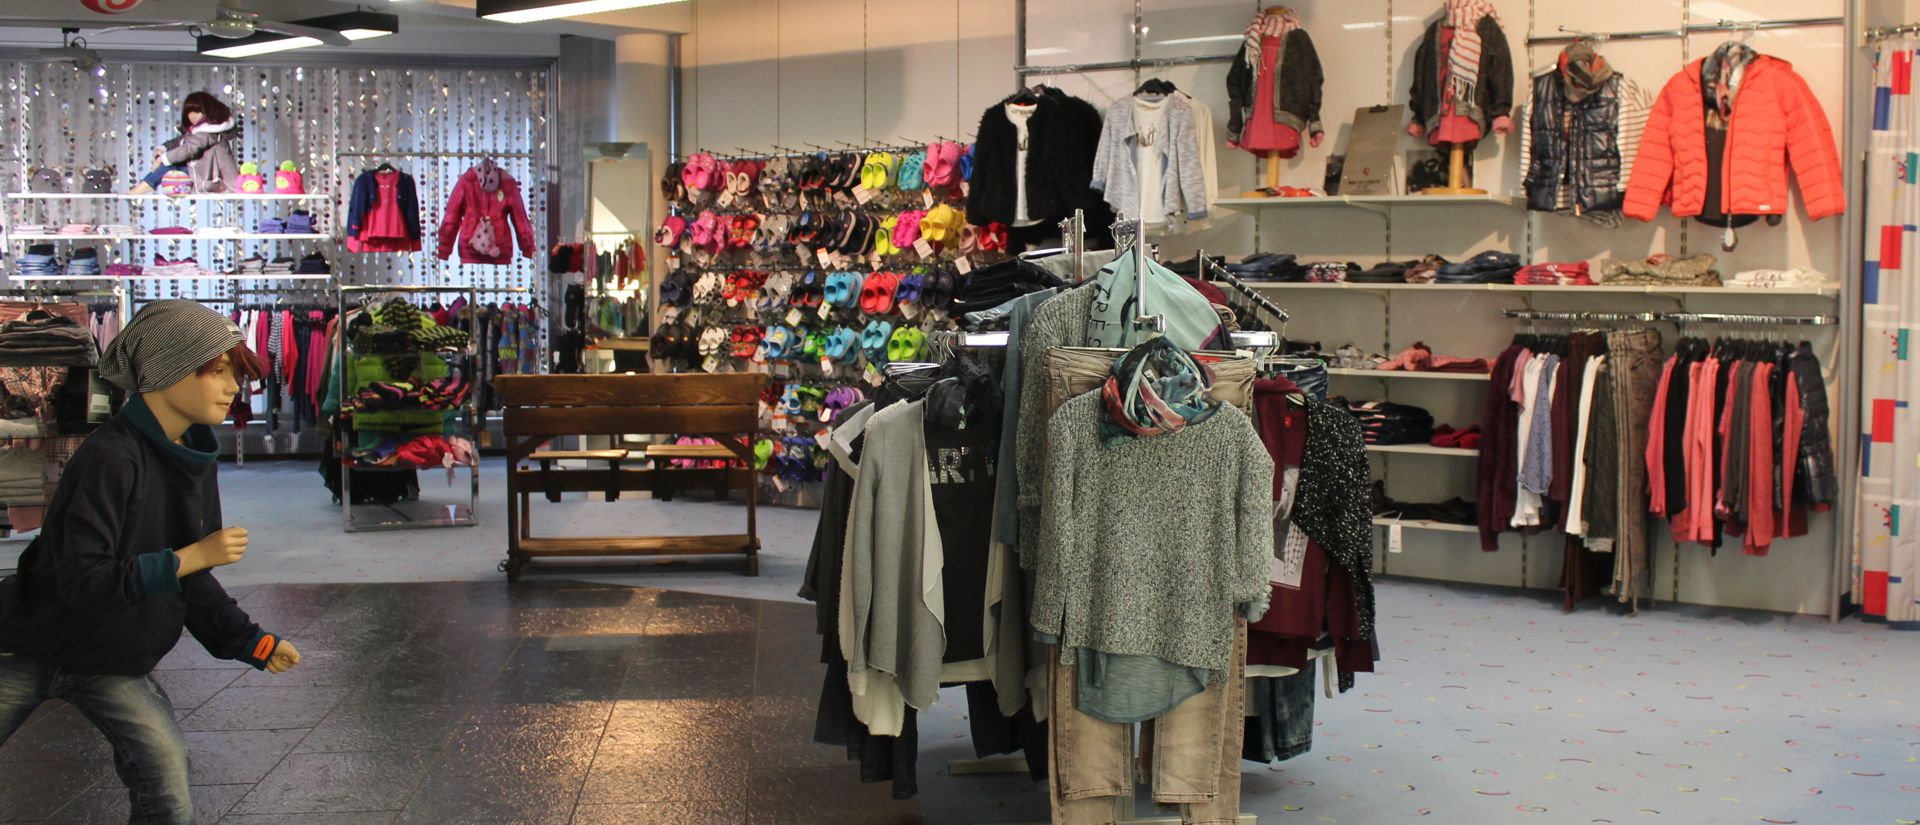 Kinderabteilung Modehaus Pöpperl Naila